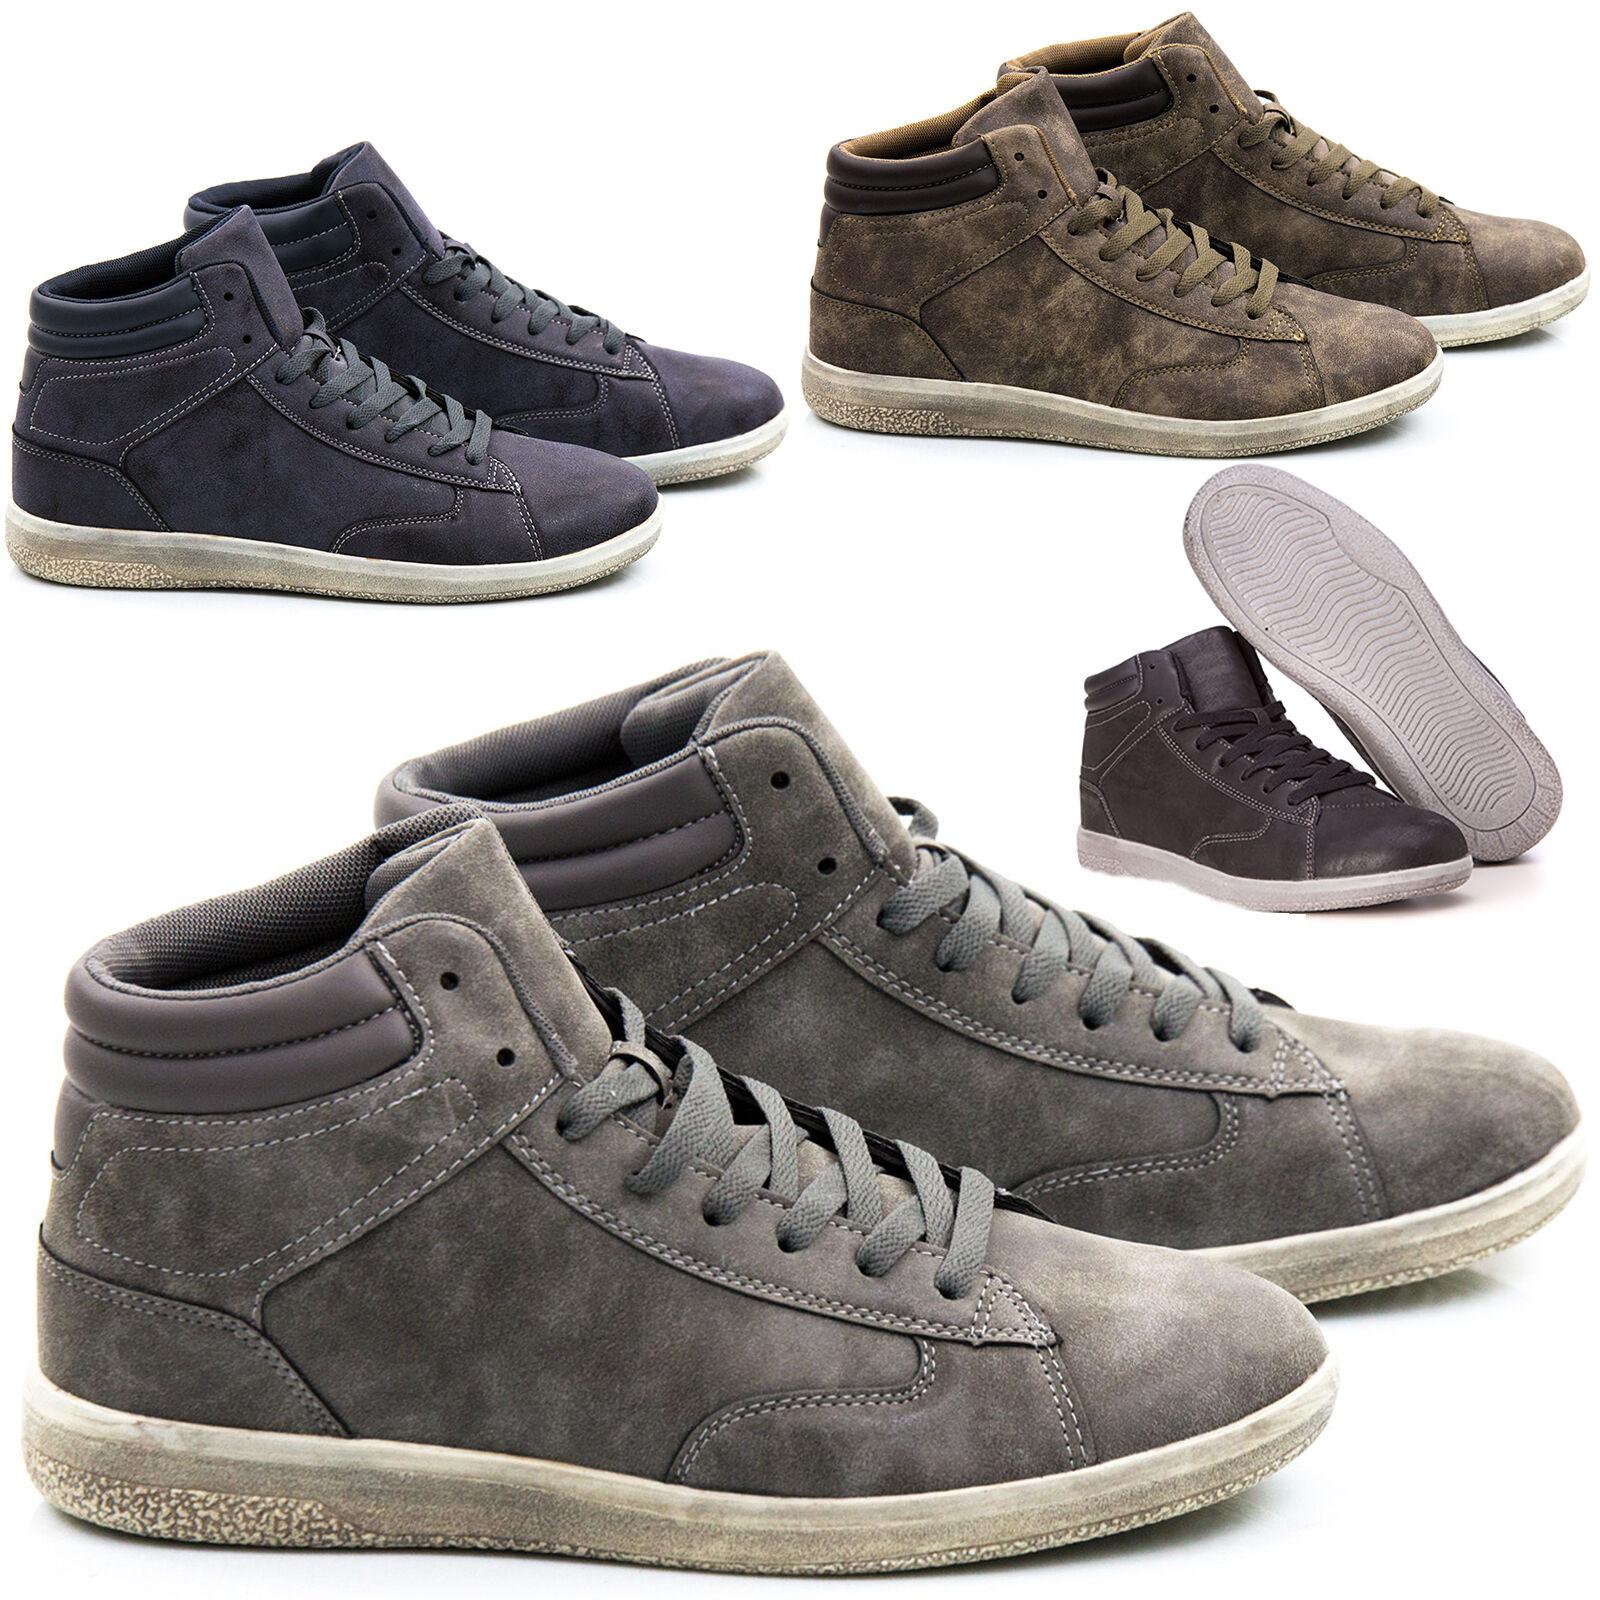 Scarpe Uomo Sneakers Pelle PU Stivali Francesine Mocassini Ginnastica Anfibi S88